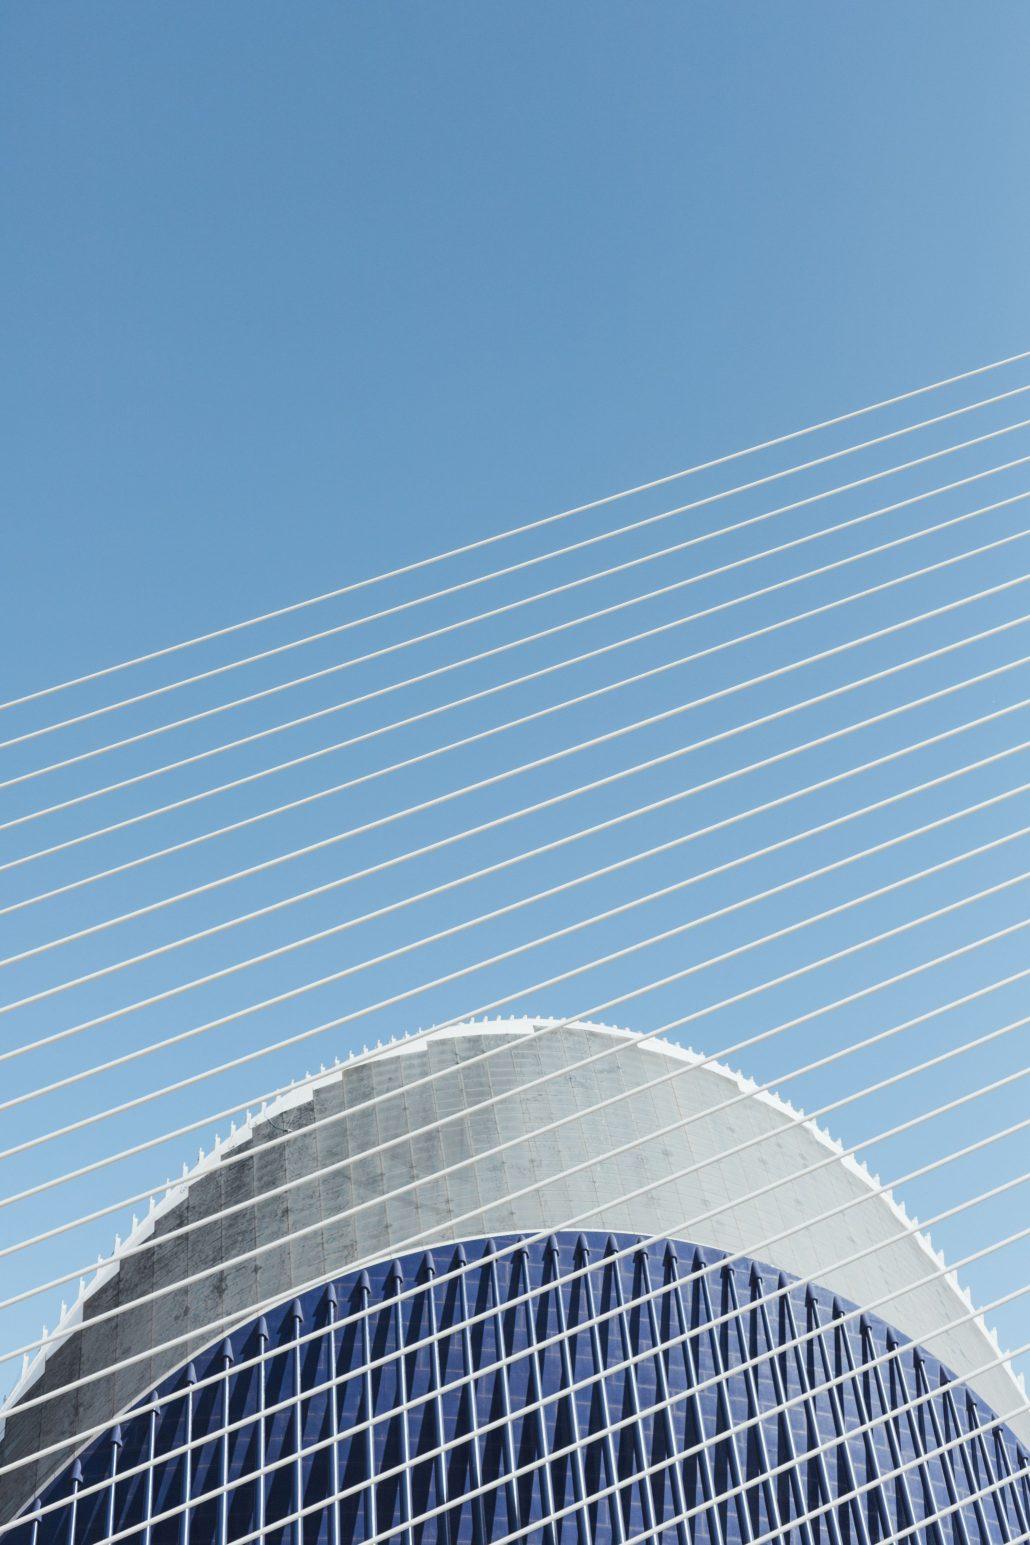 Ciel bleu et lignes